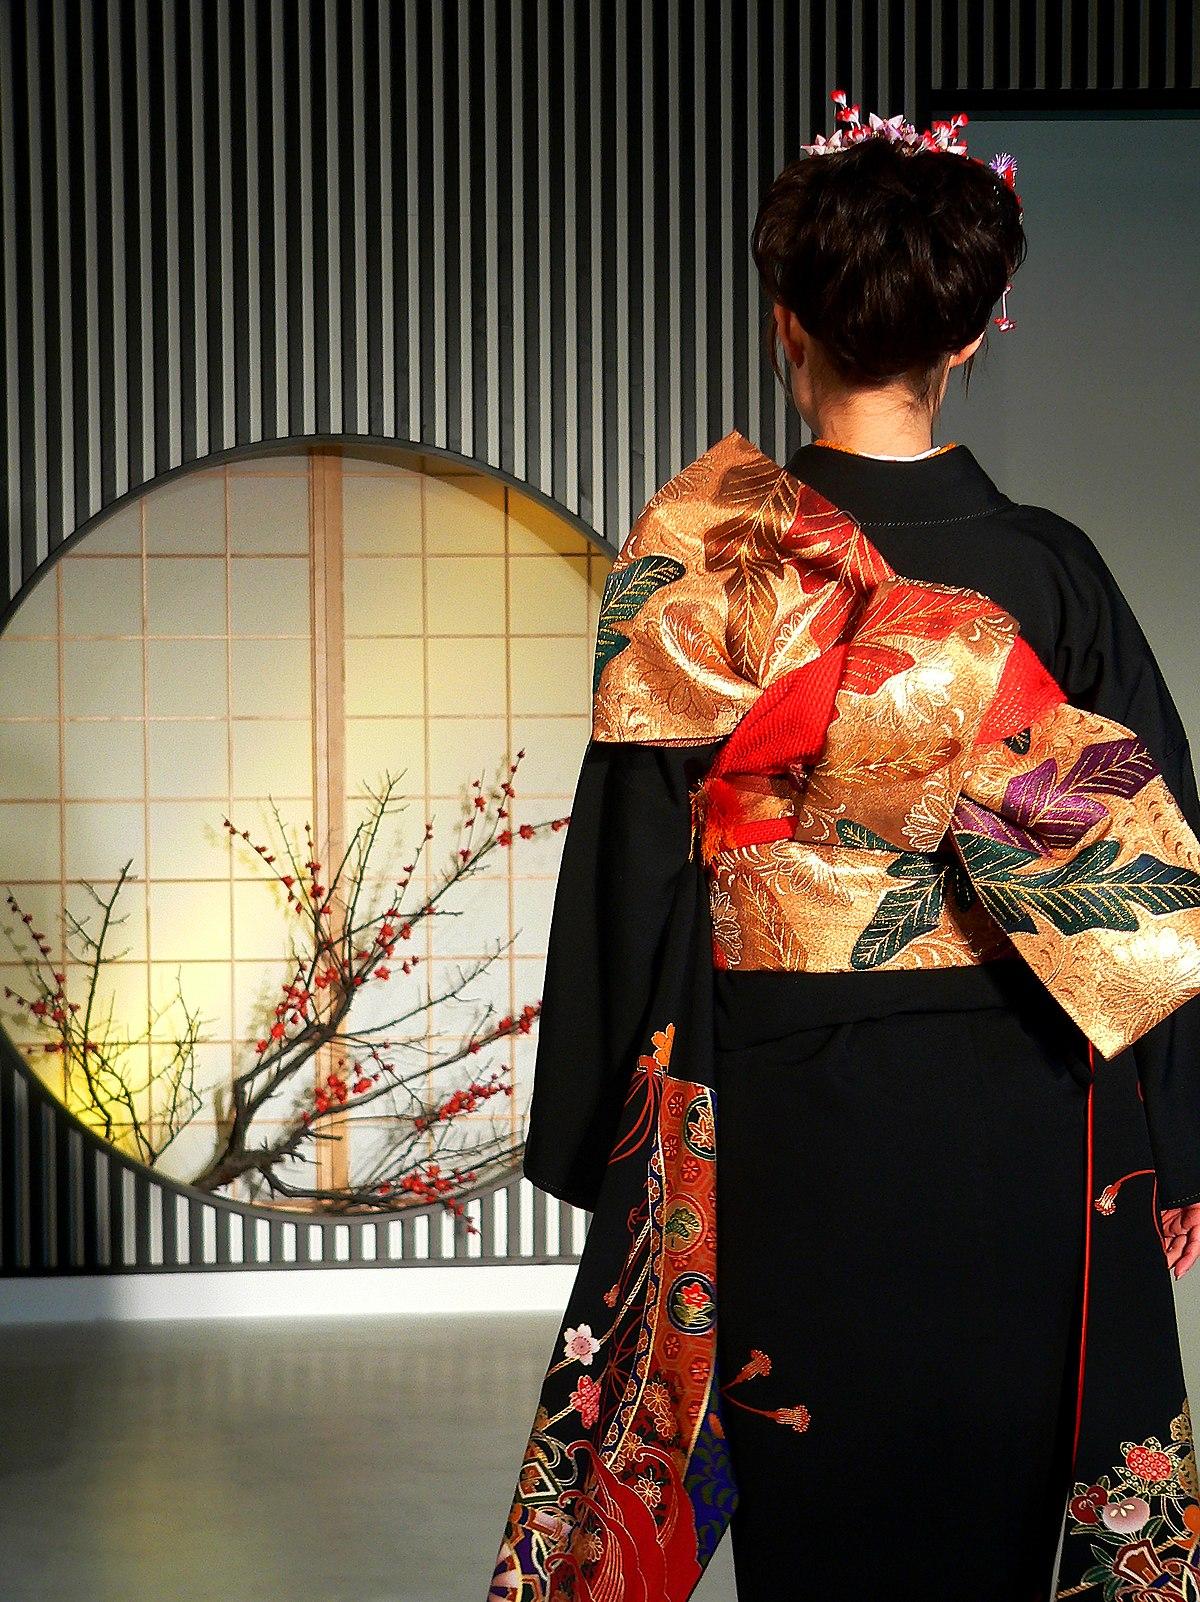 Kimono - Wikipedia, la enciclopedia libre